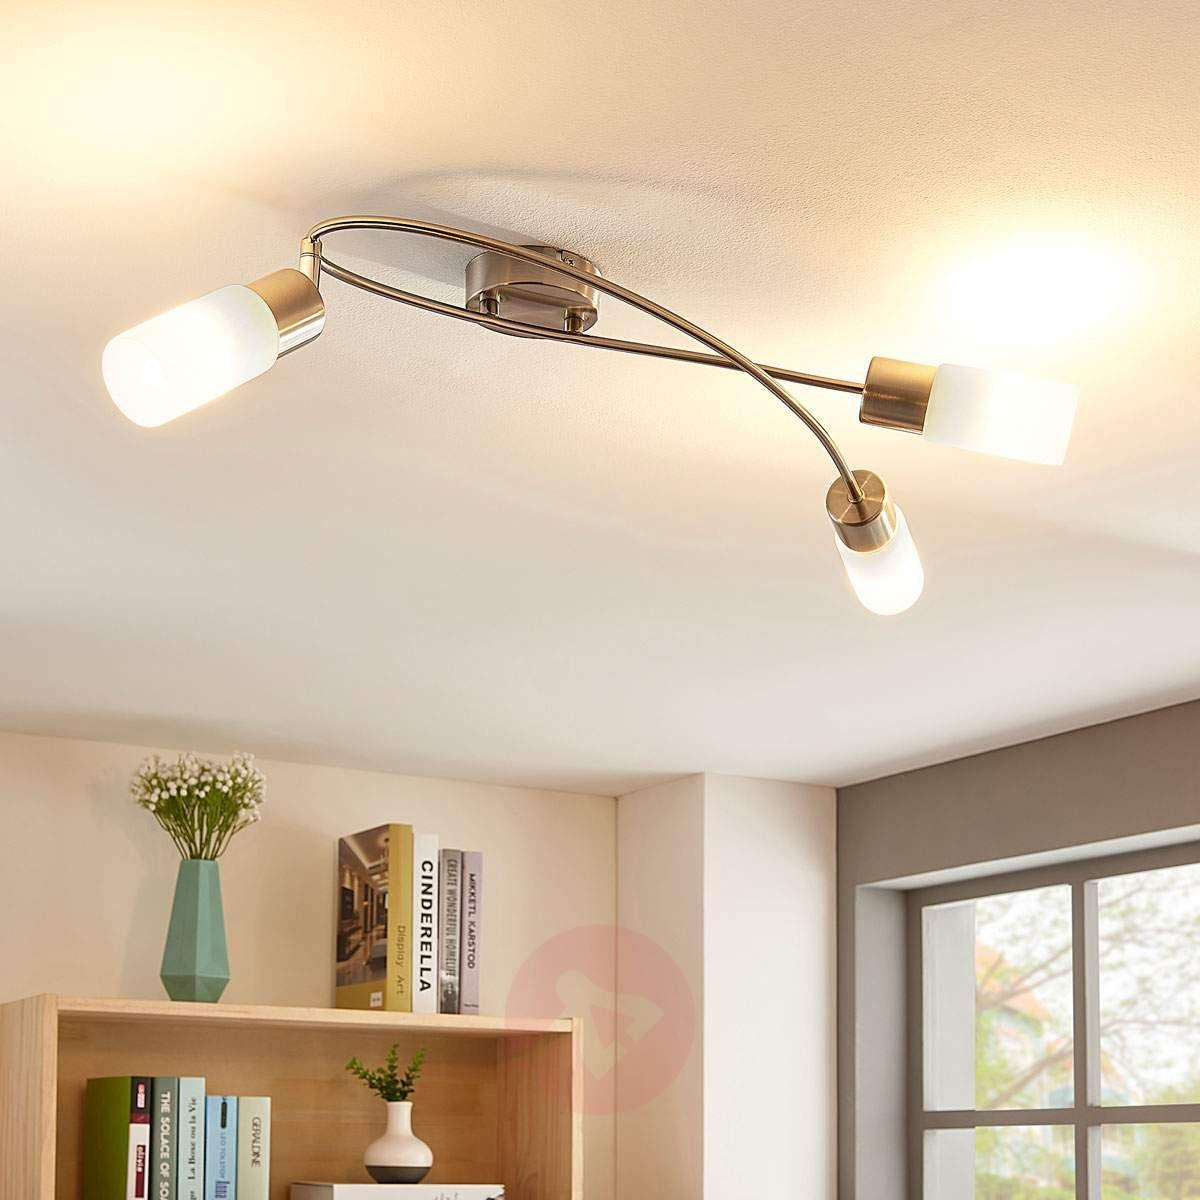 Lampa Sufitowa Led Easydim Erva 3 Punktowa Lampy Sufitowe